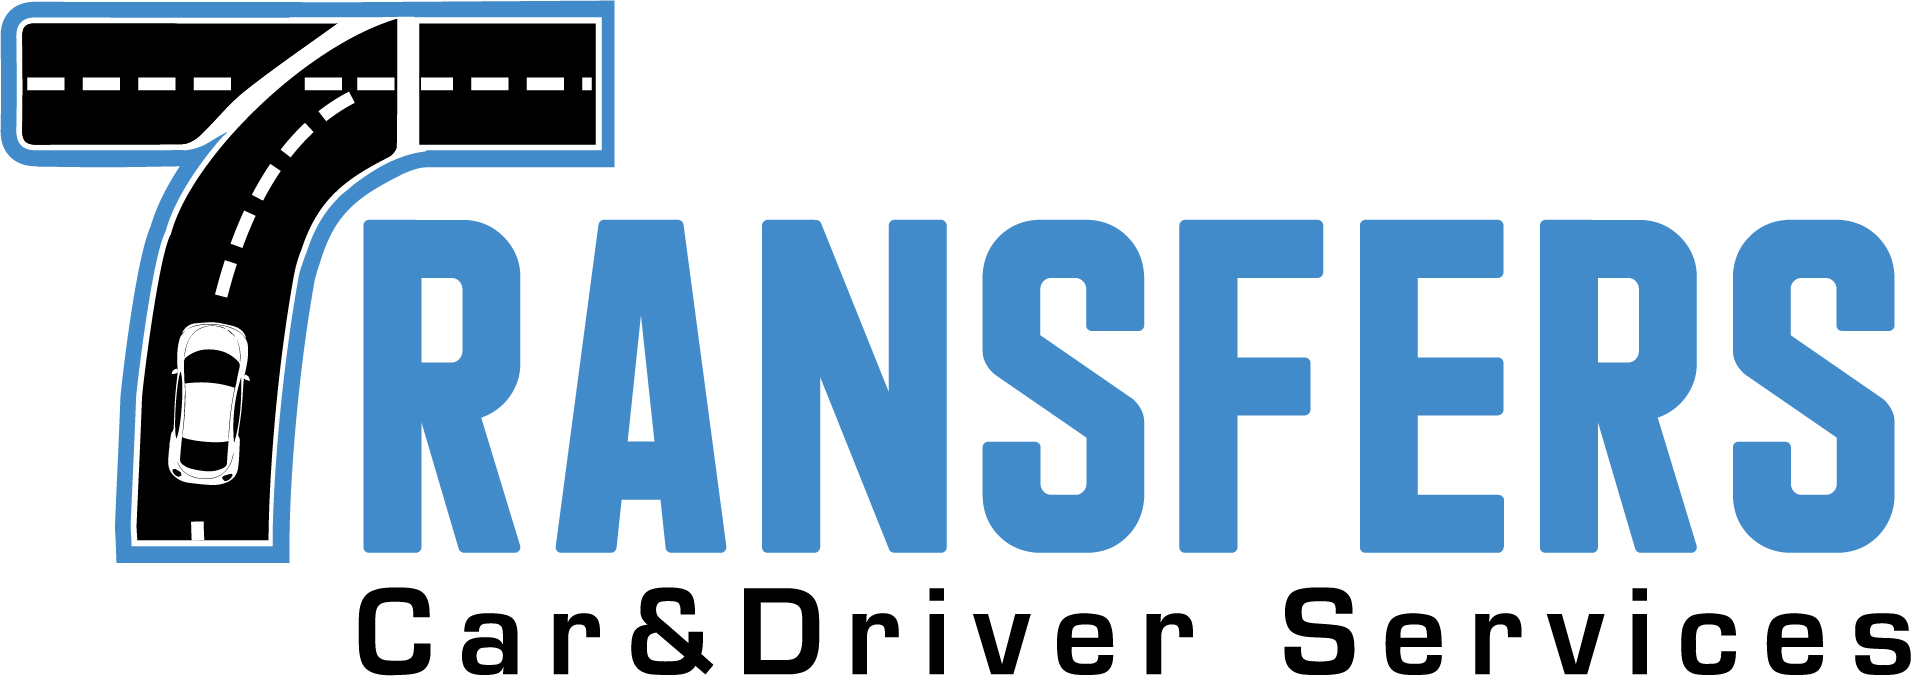 7transfers